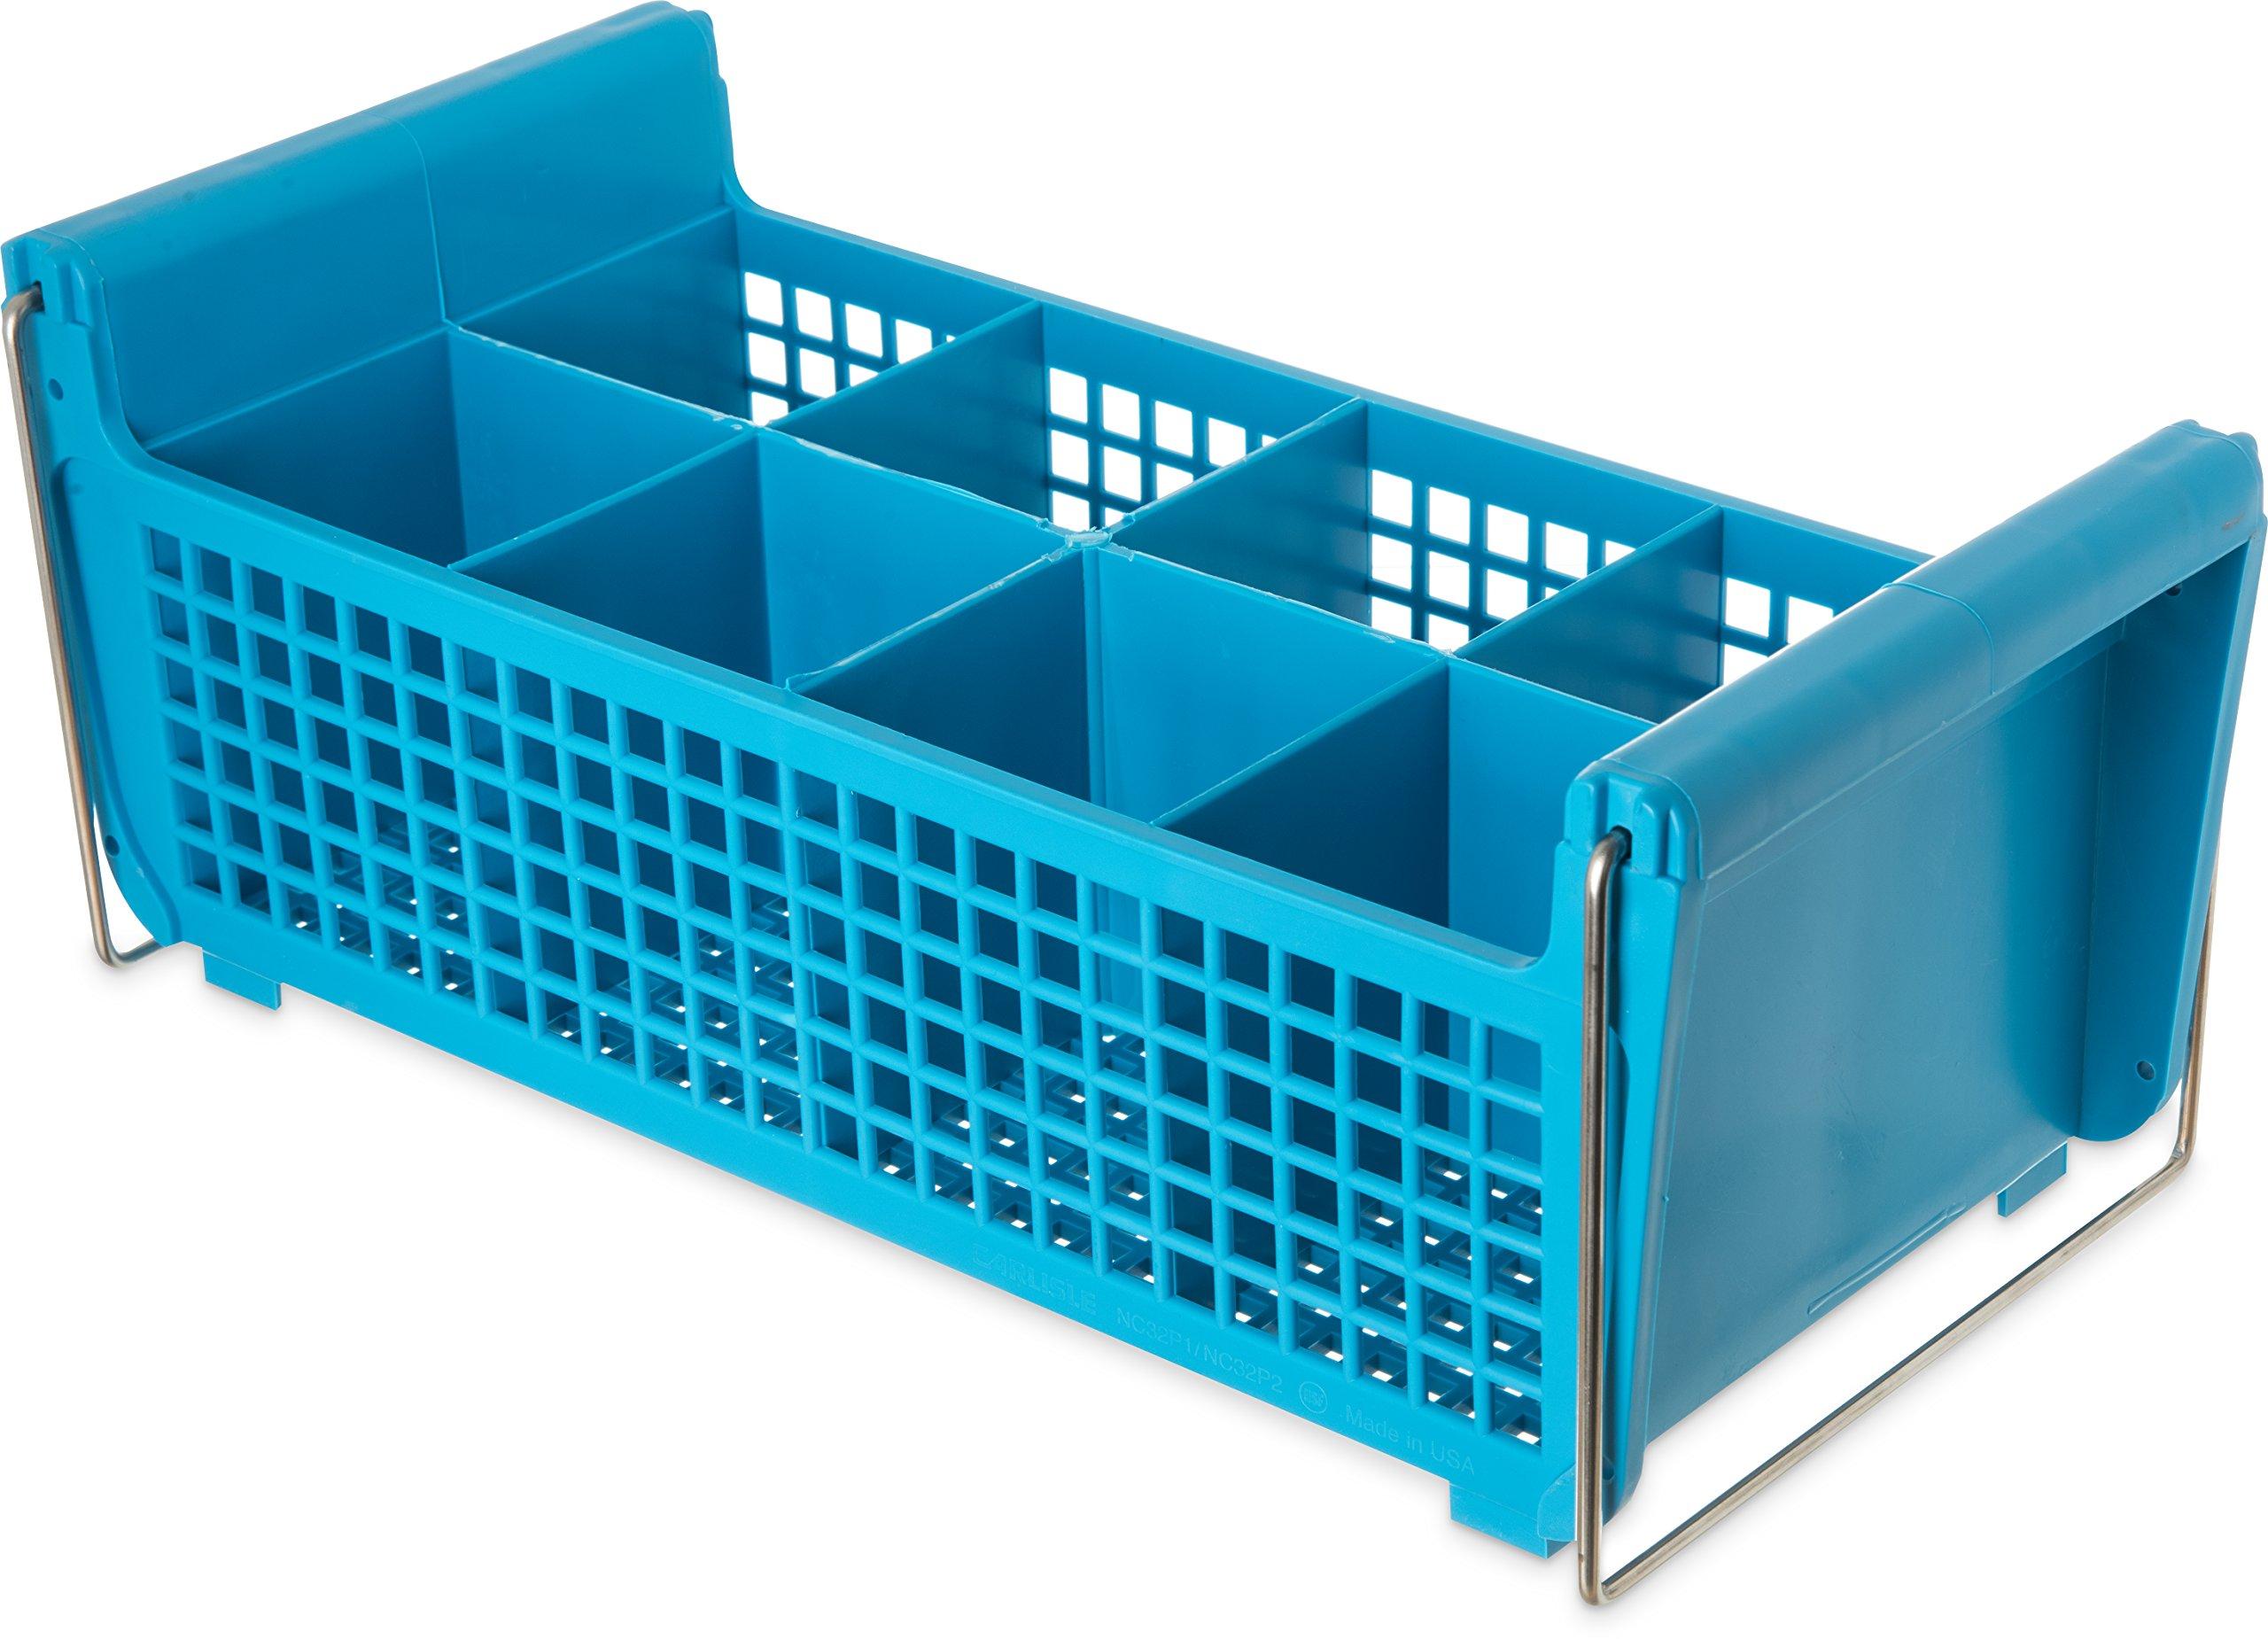 Carlisle C32P214 OptiClean Polypropylene Flatware Basket with Handle, 17-1/16'' L x 7-3/4'' W x 6-7/8'' H, Carlisle Blue (Case of 6)